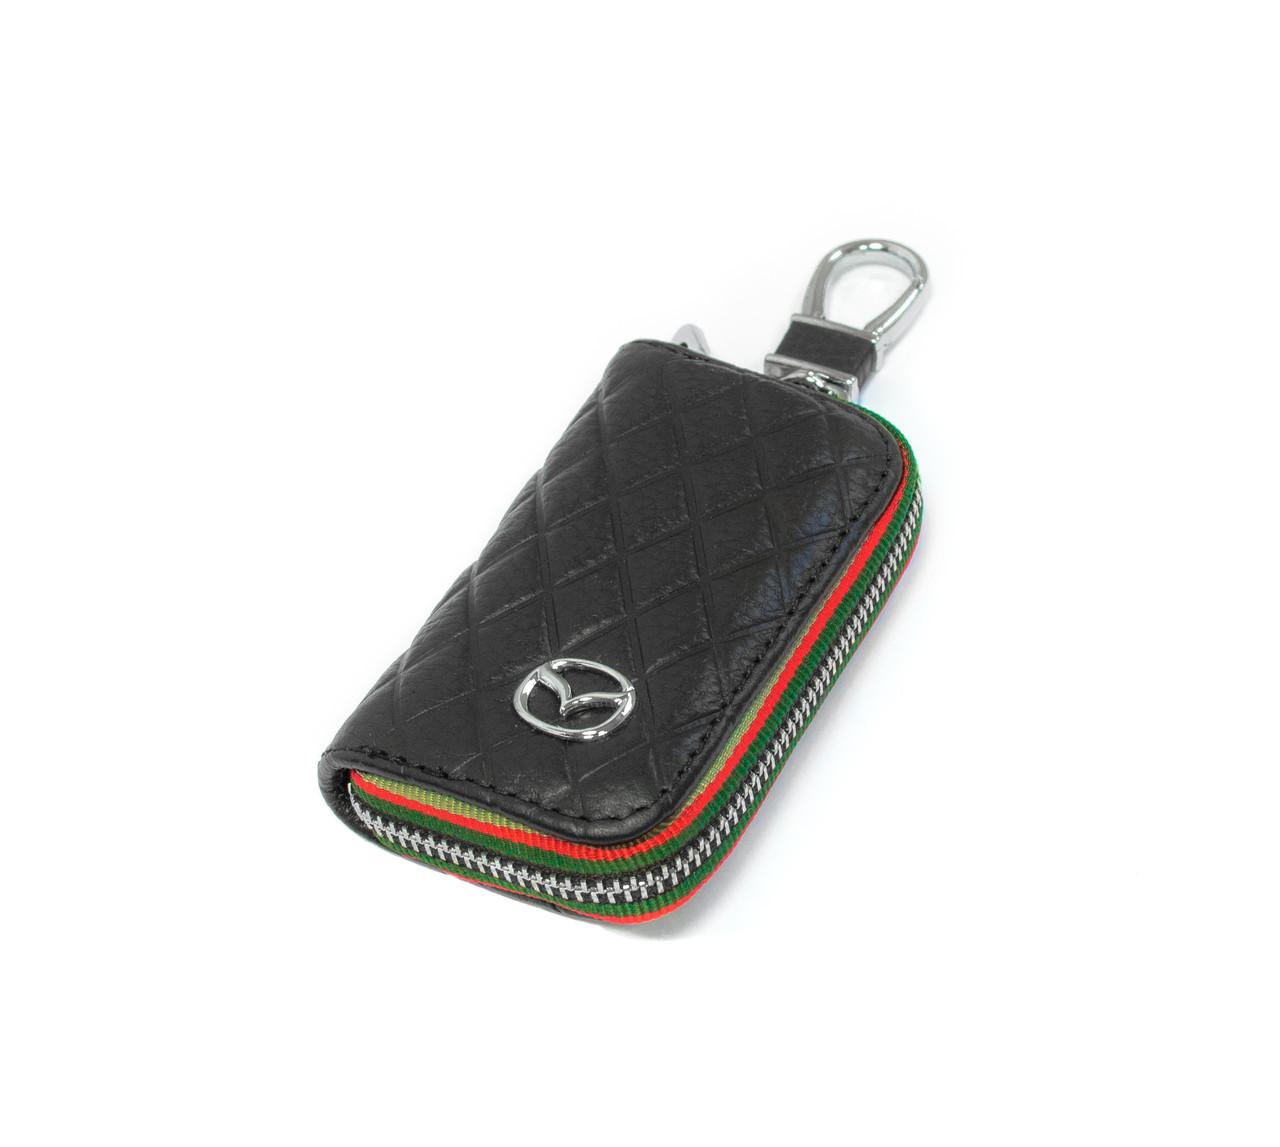 Ключница Carss с логотипом MAZDA 16009 черная